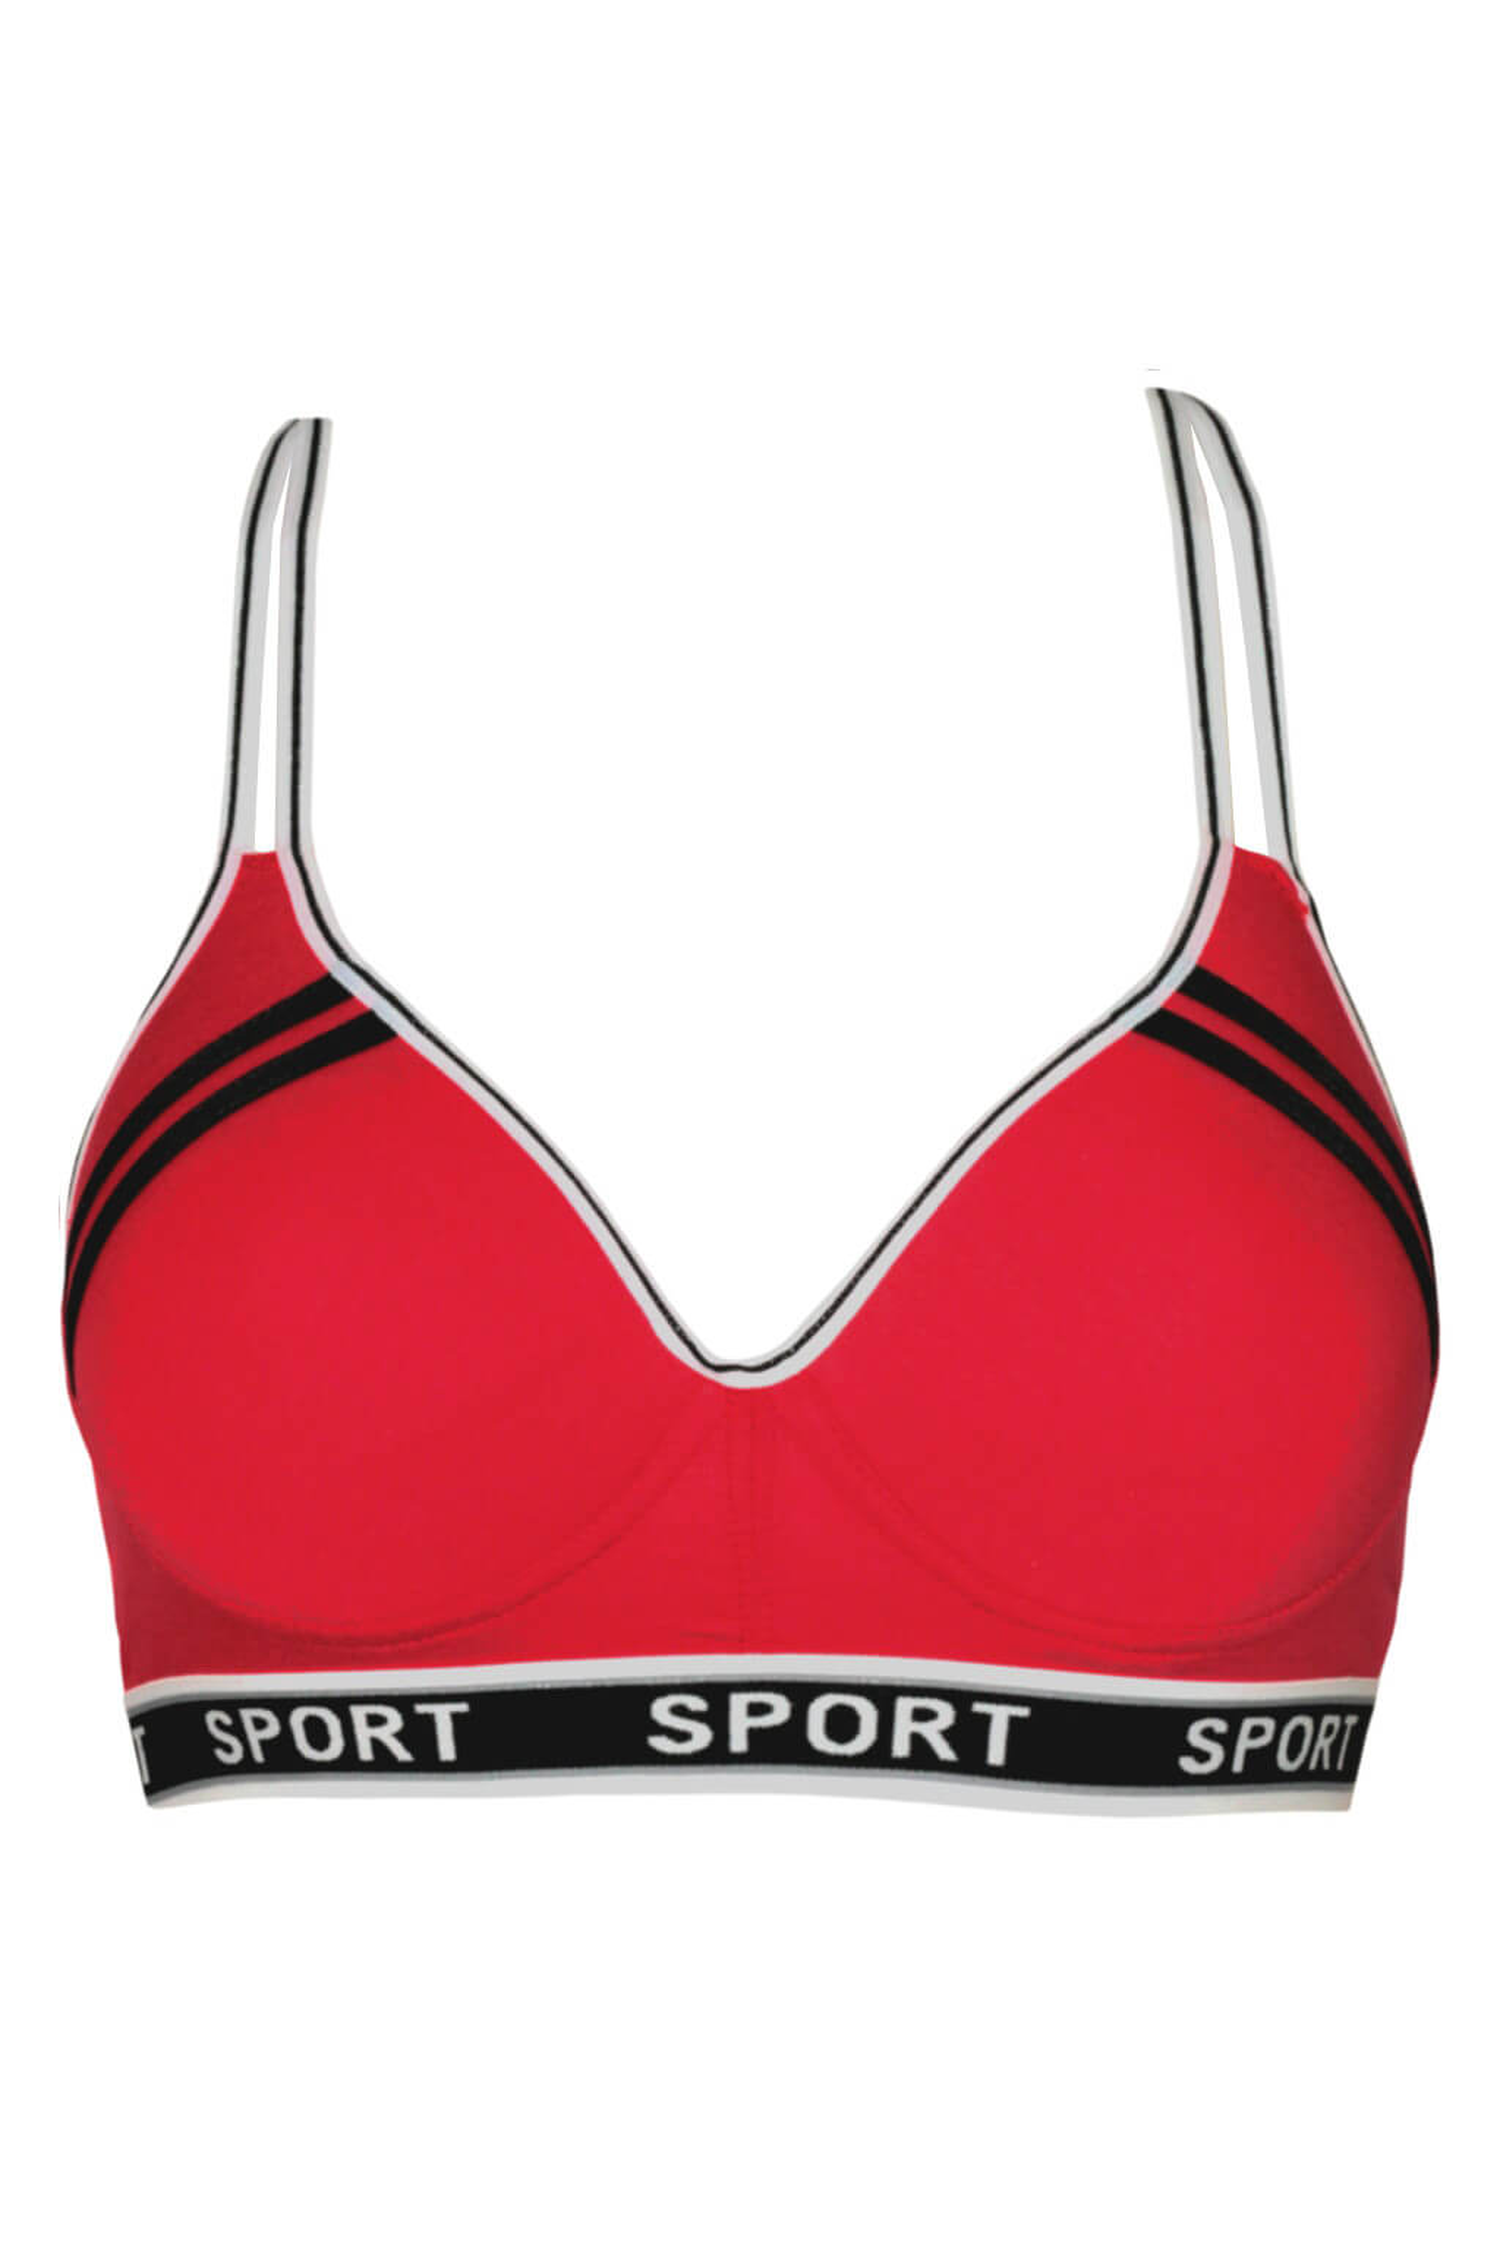 Mon Cheri Sport podprsenka s krajkou 75B červená